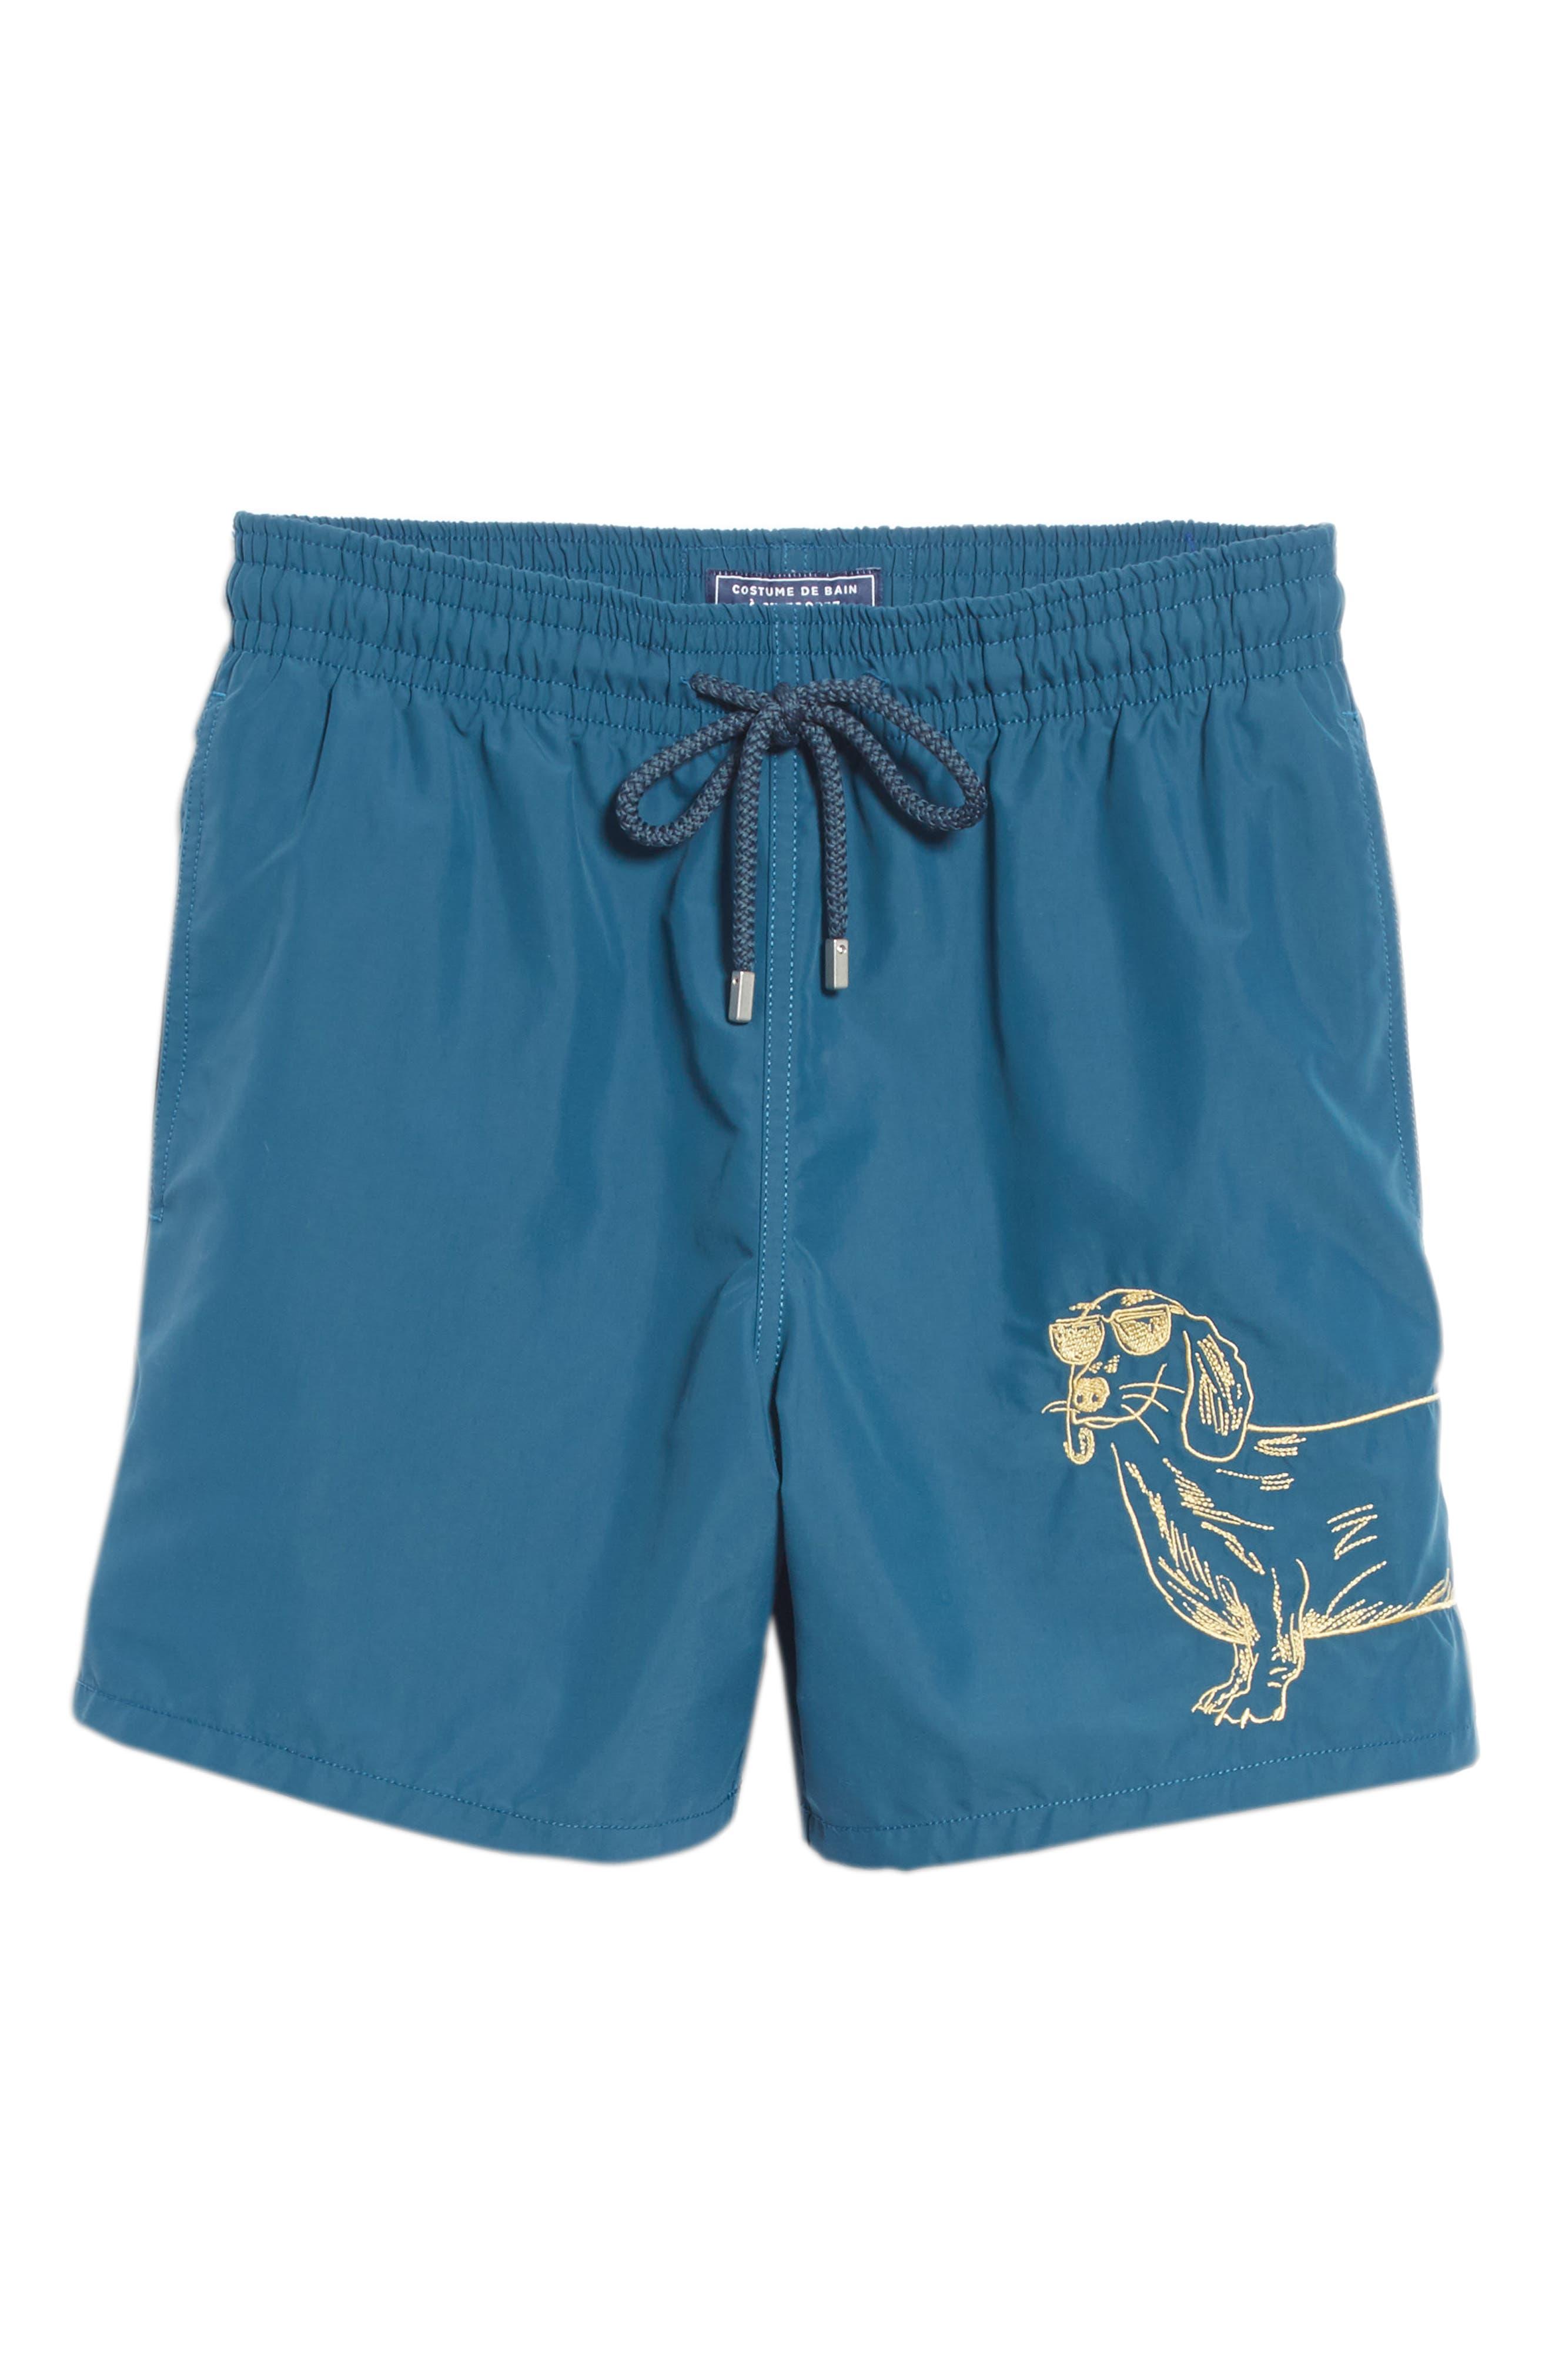 Embroidered Sunny Dog Swim Trunks,                             Alternate thumbnail 6, color,                             471